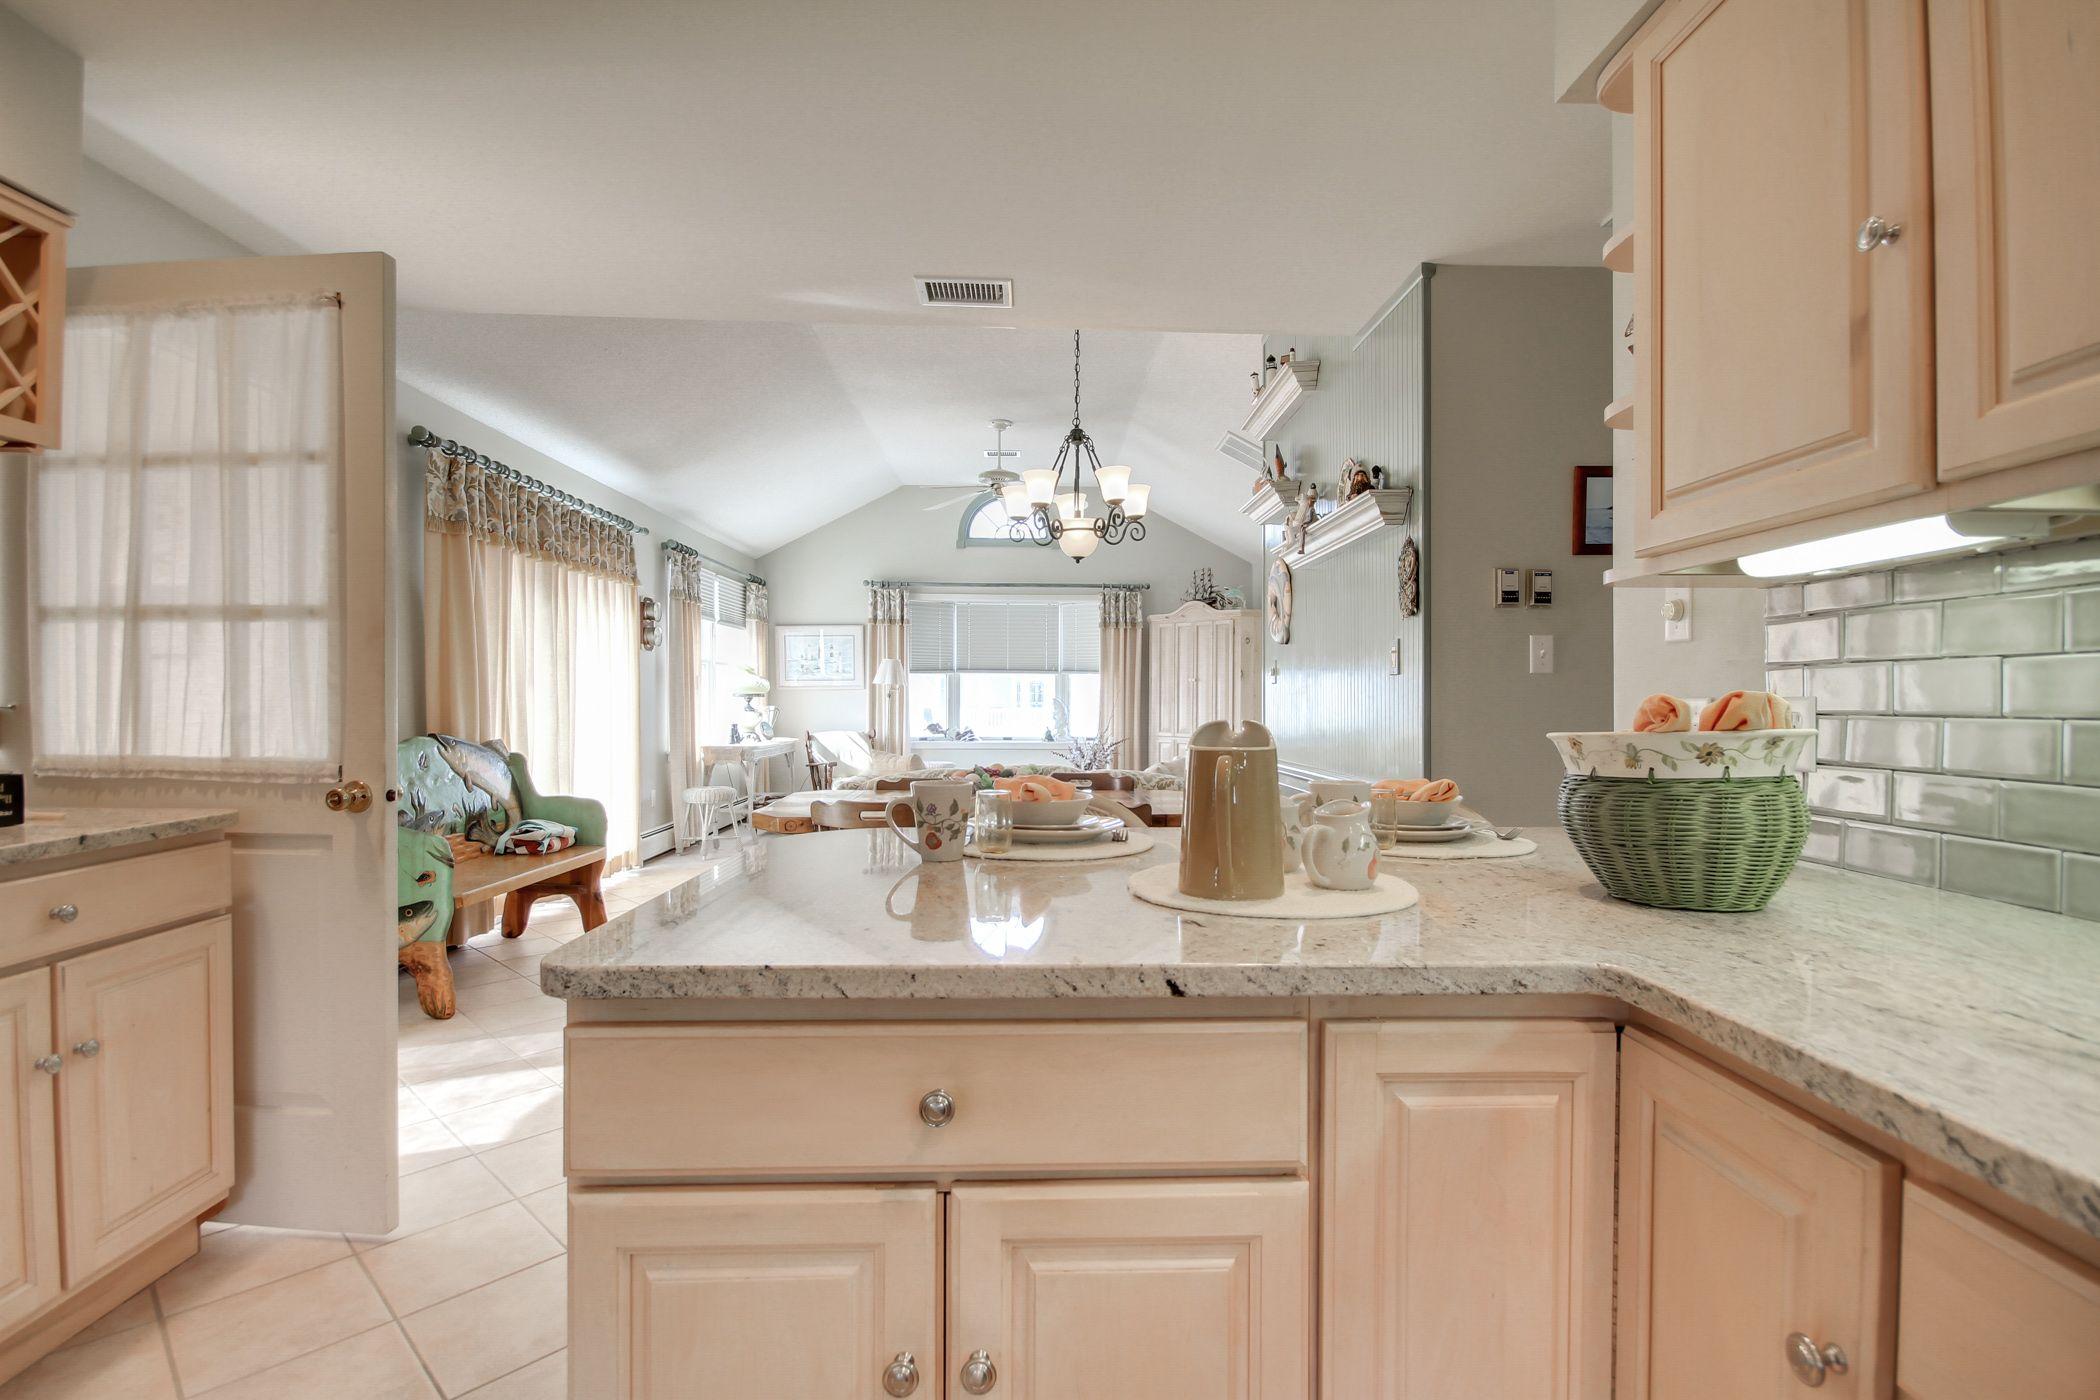 Best Beach House Kitchen With Crema Astoria Granite Countertops 400 x 300